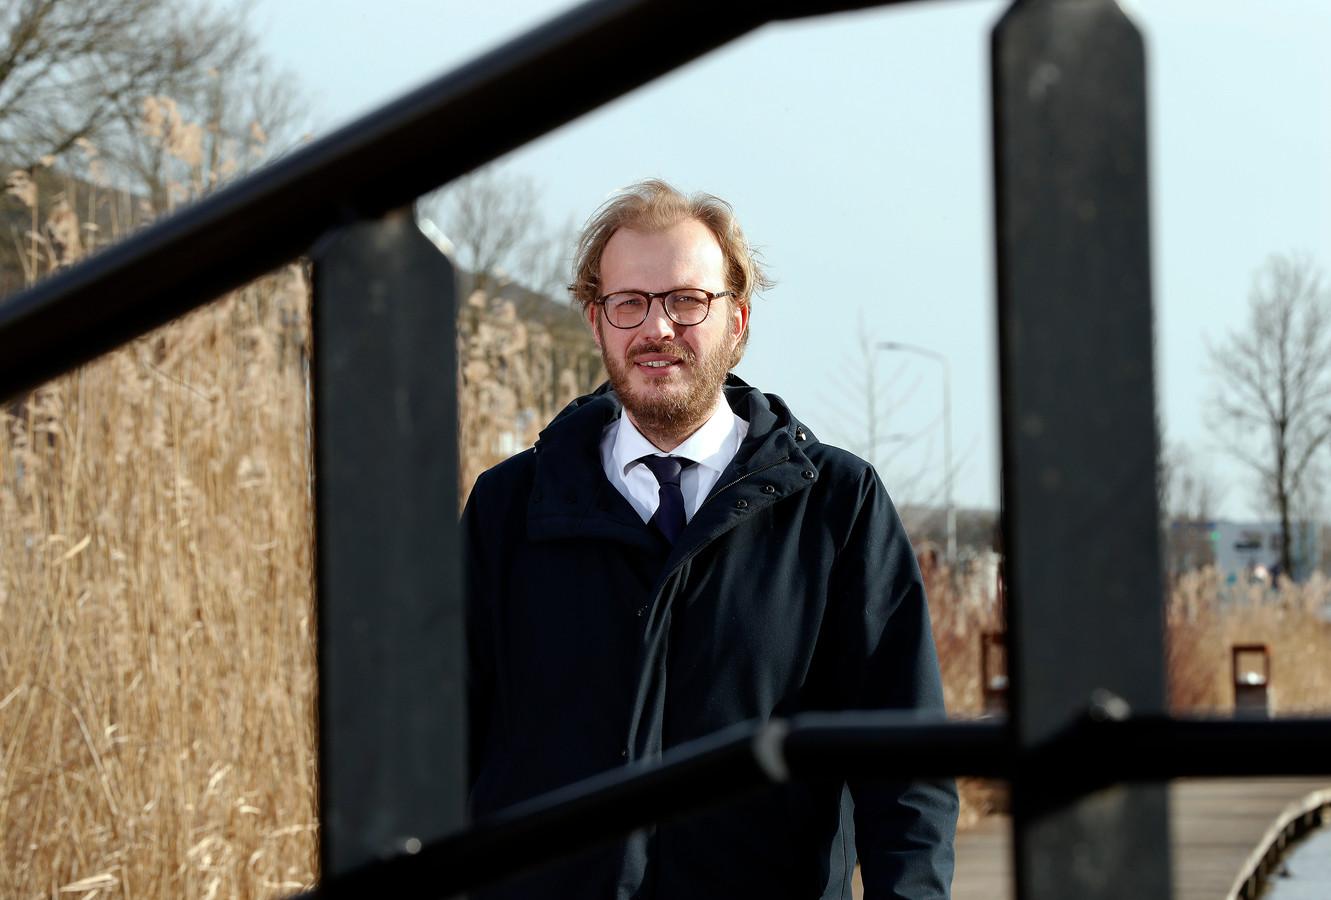 Burgmeester Mark Boumans.